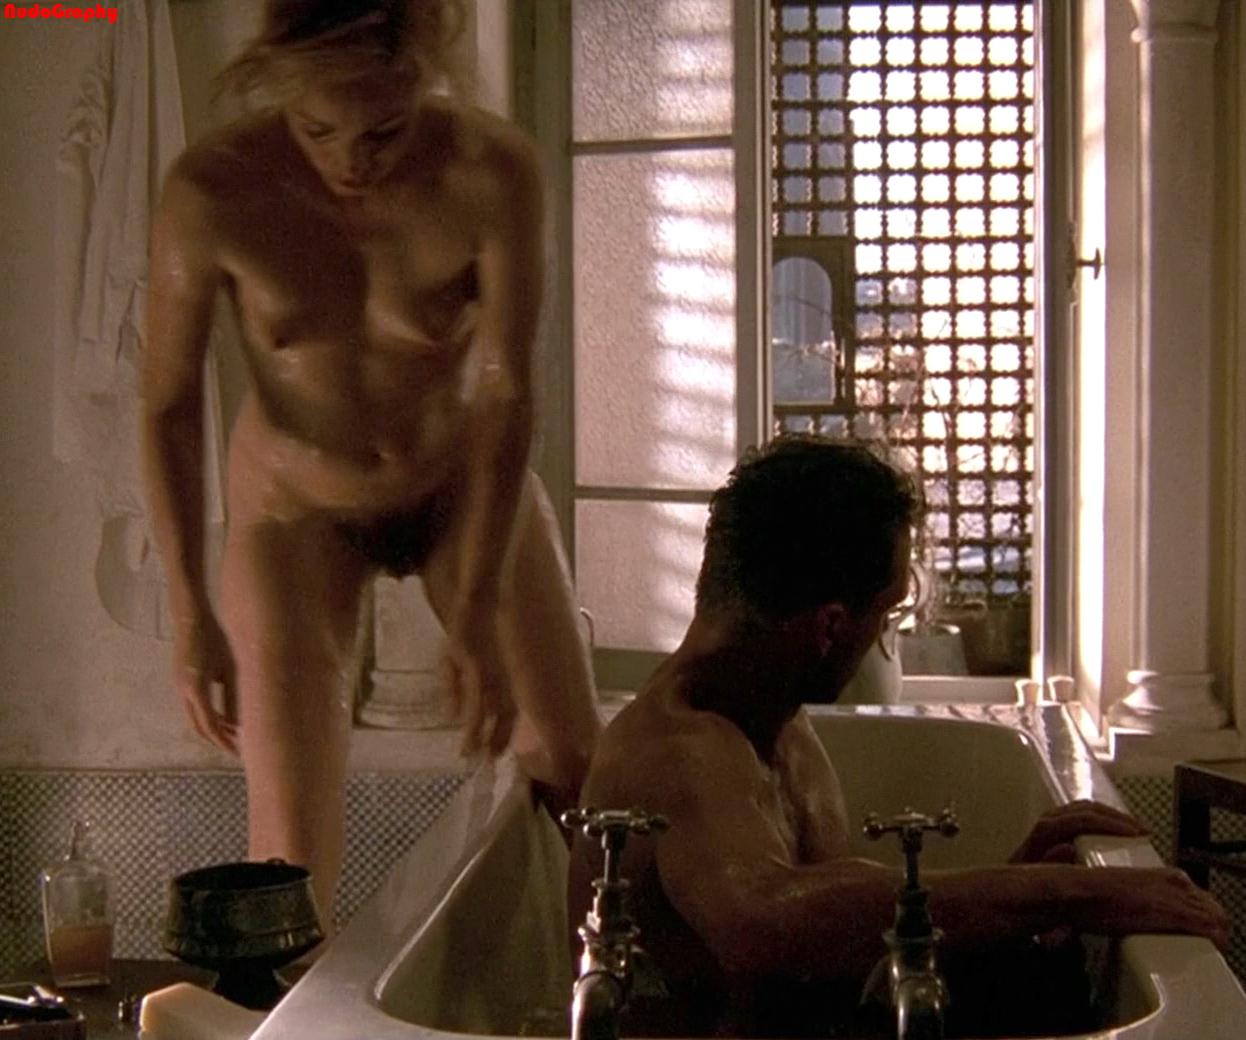 dougray scott nude discret romance jouets sexuels